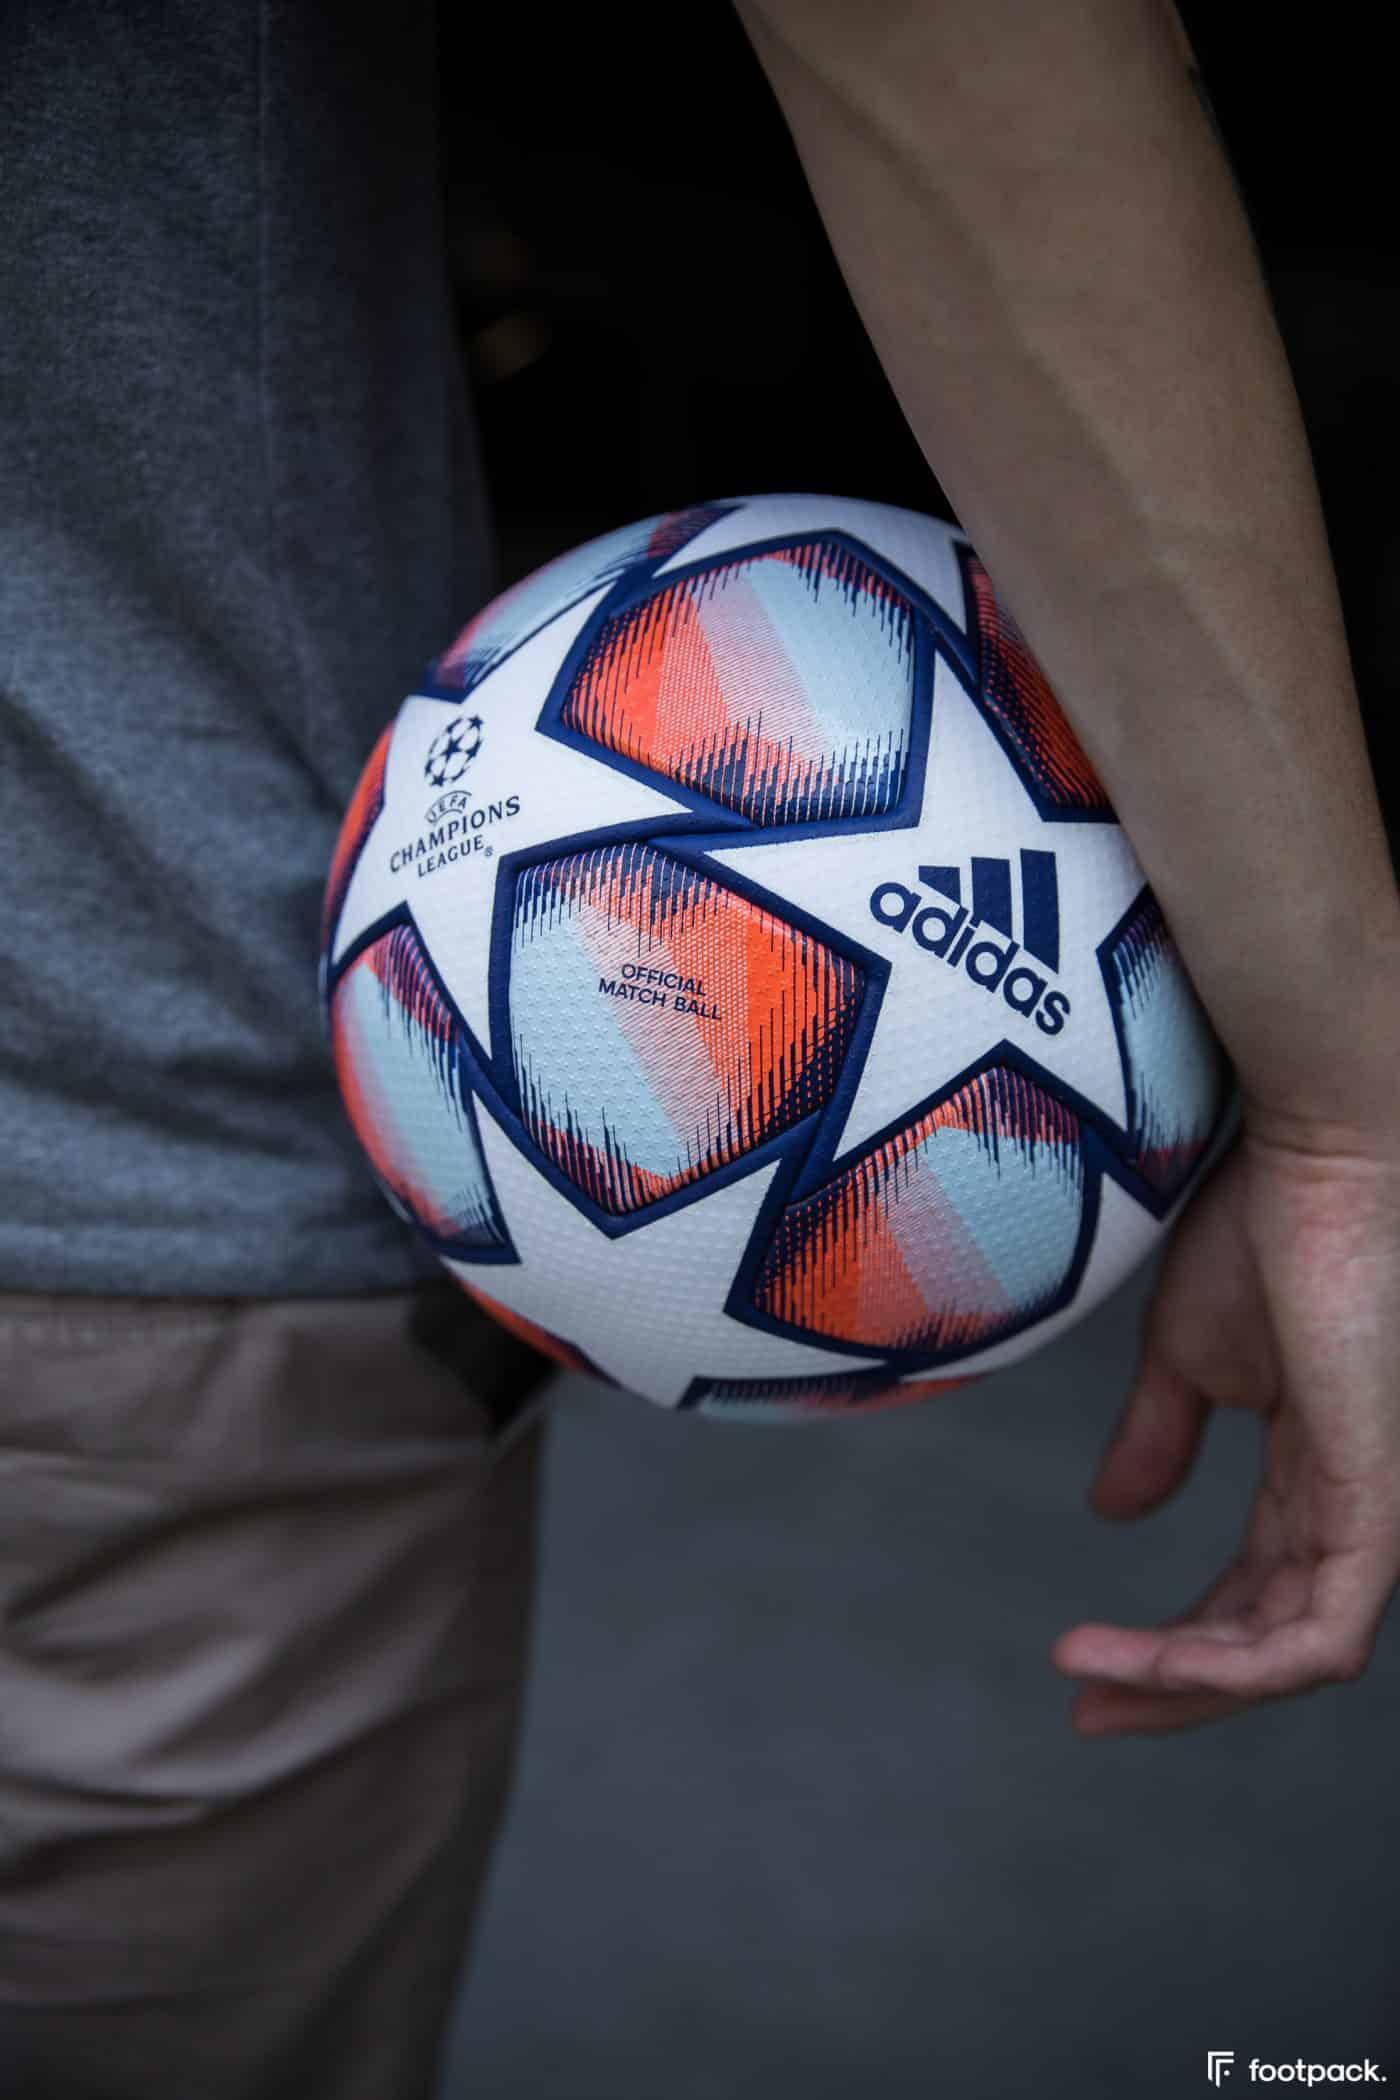 ballon-champions-league-2020-2021-adidas-footpack-1